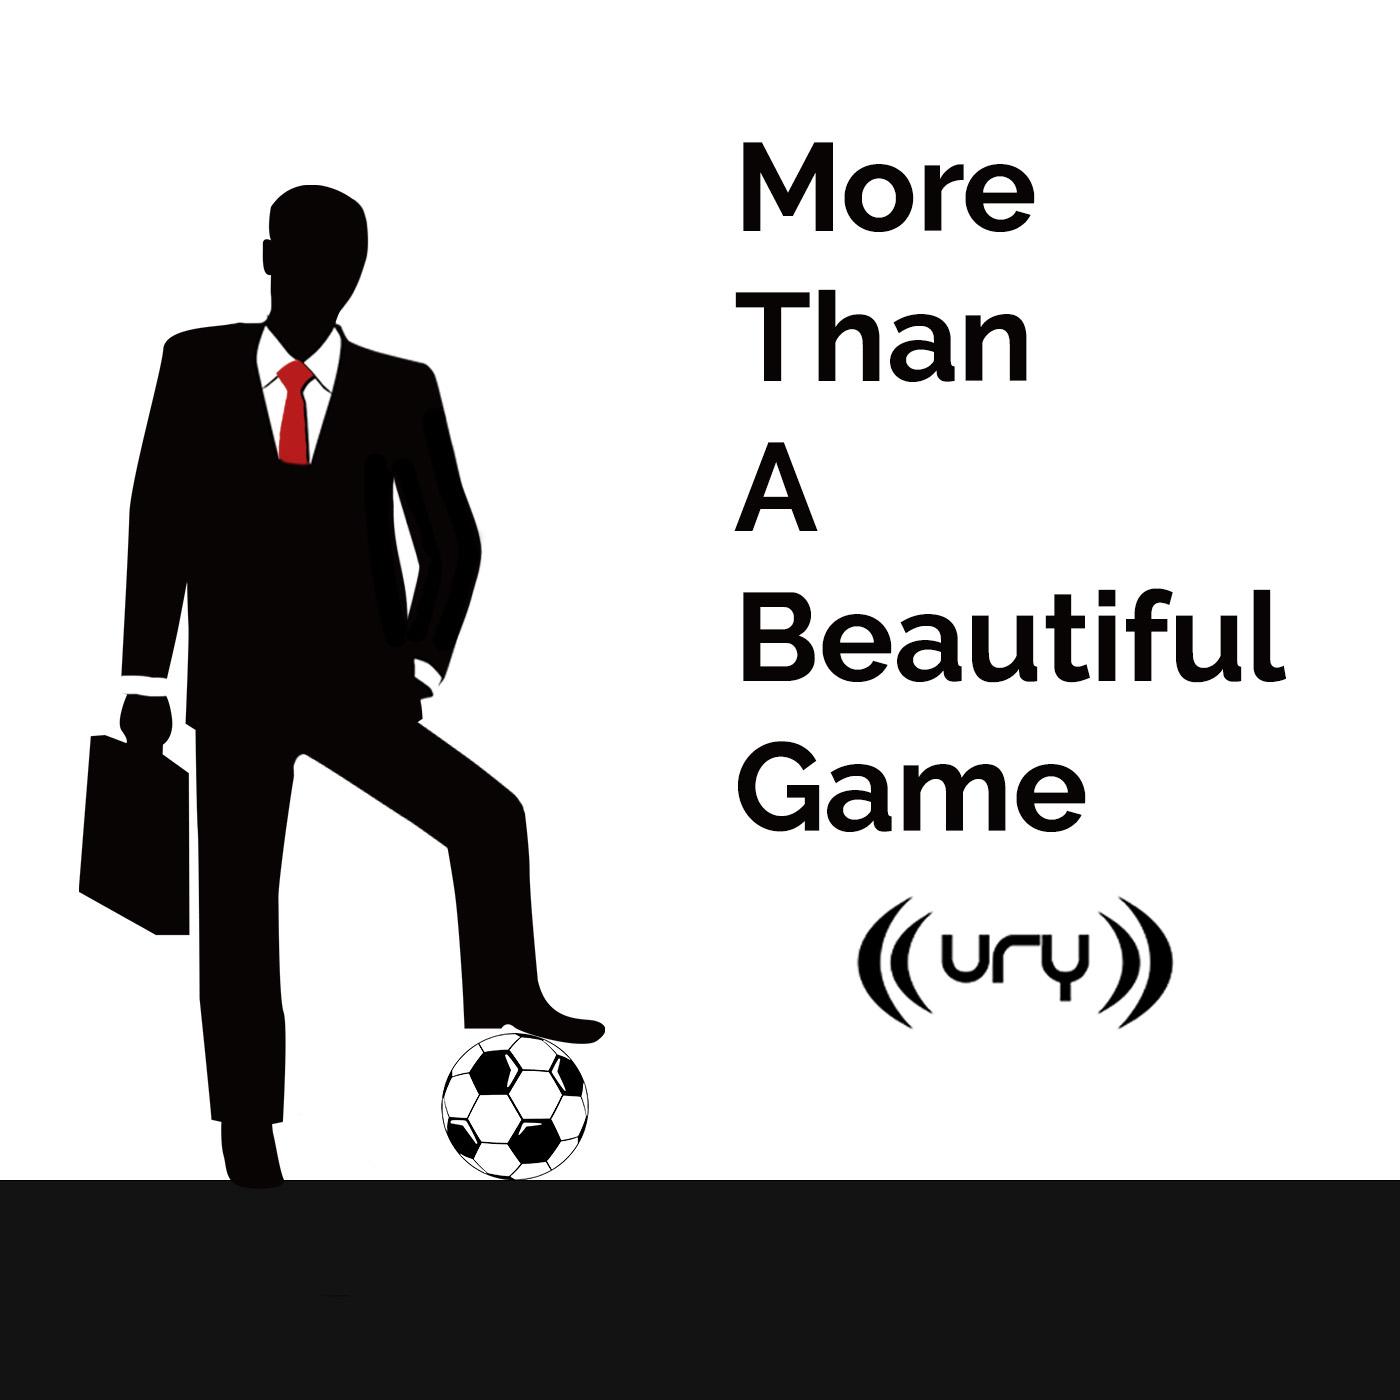 More Than A Beautiful Game Logo